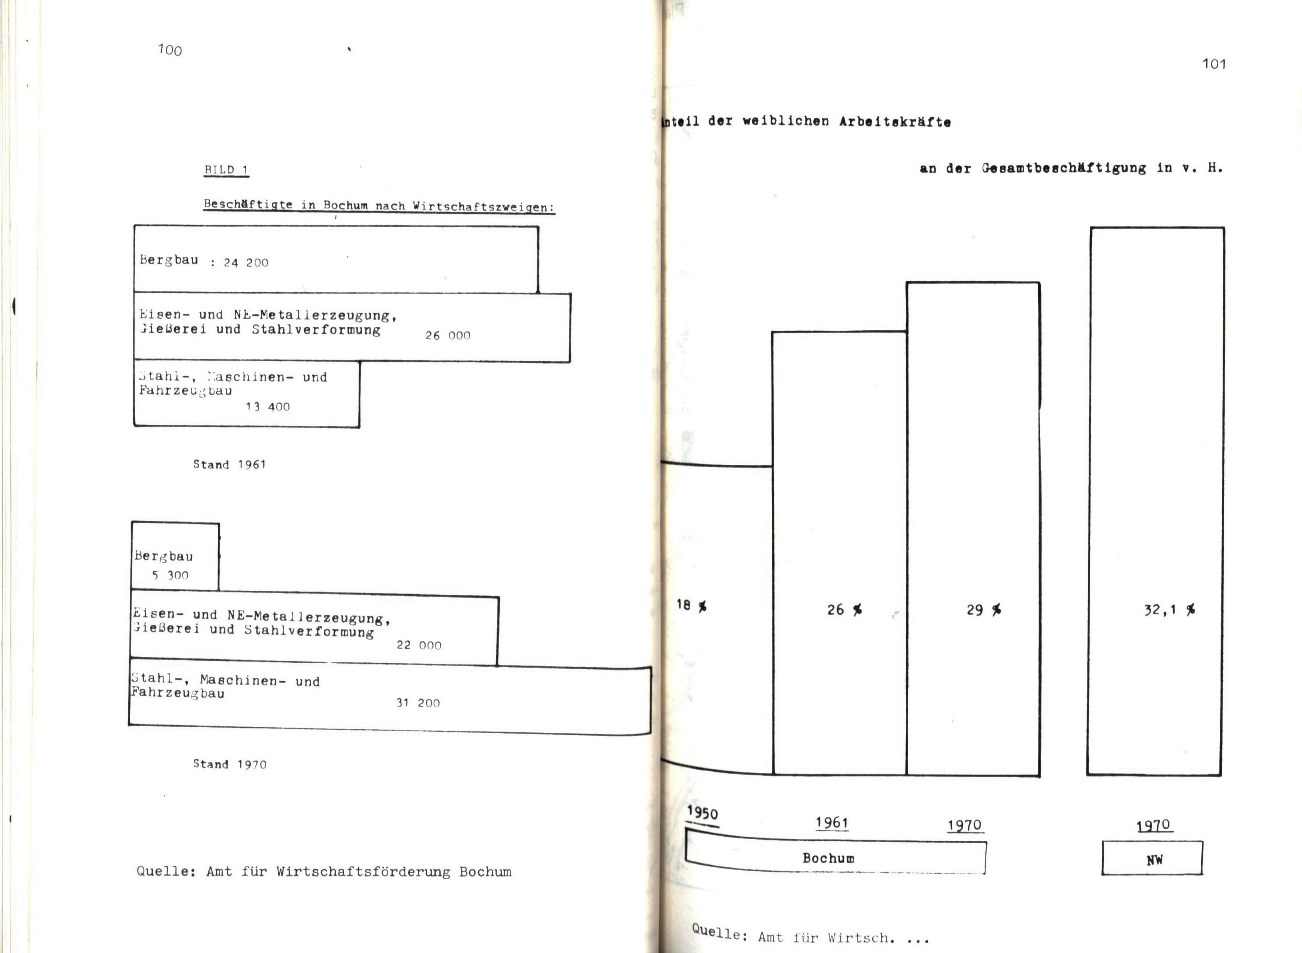 Bochum_IGM_Opel_PG_Opel_streikt_1973_052